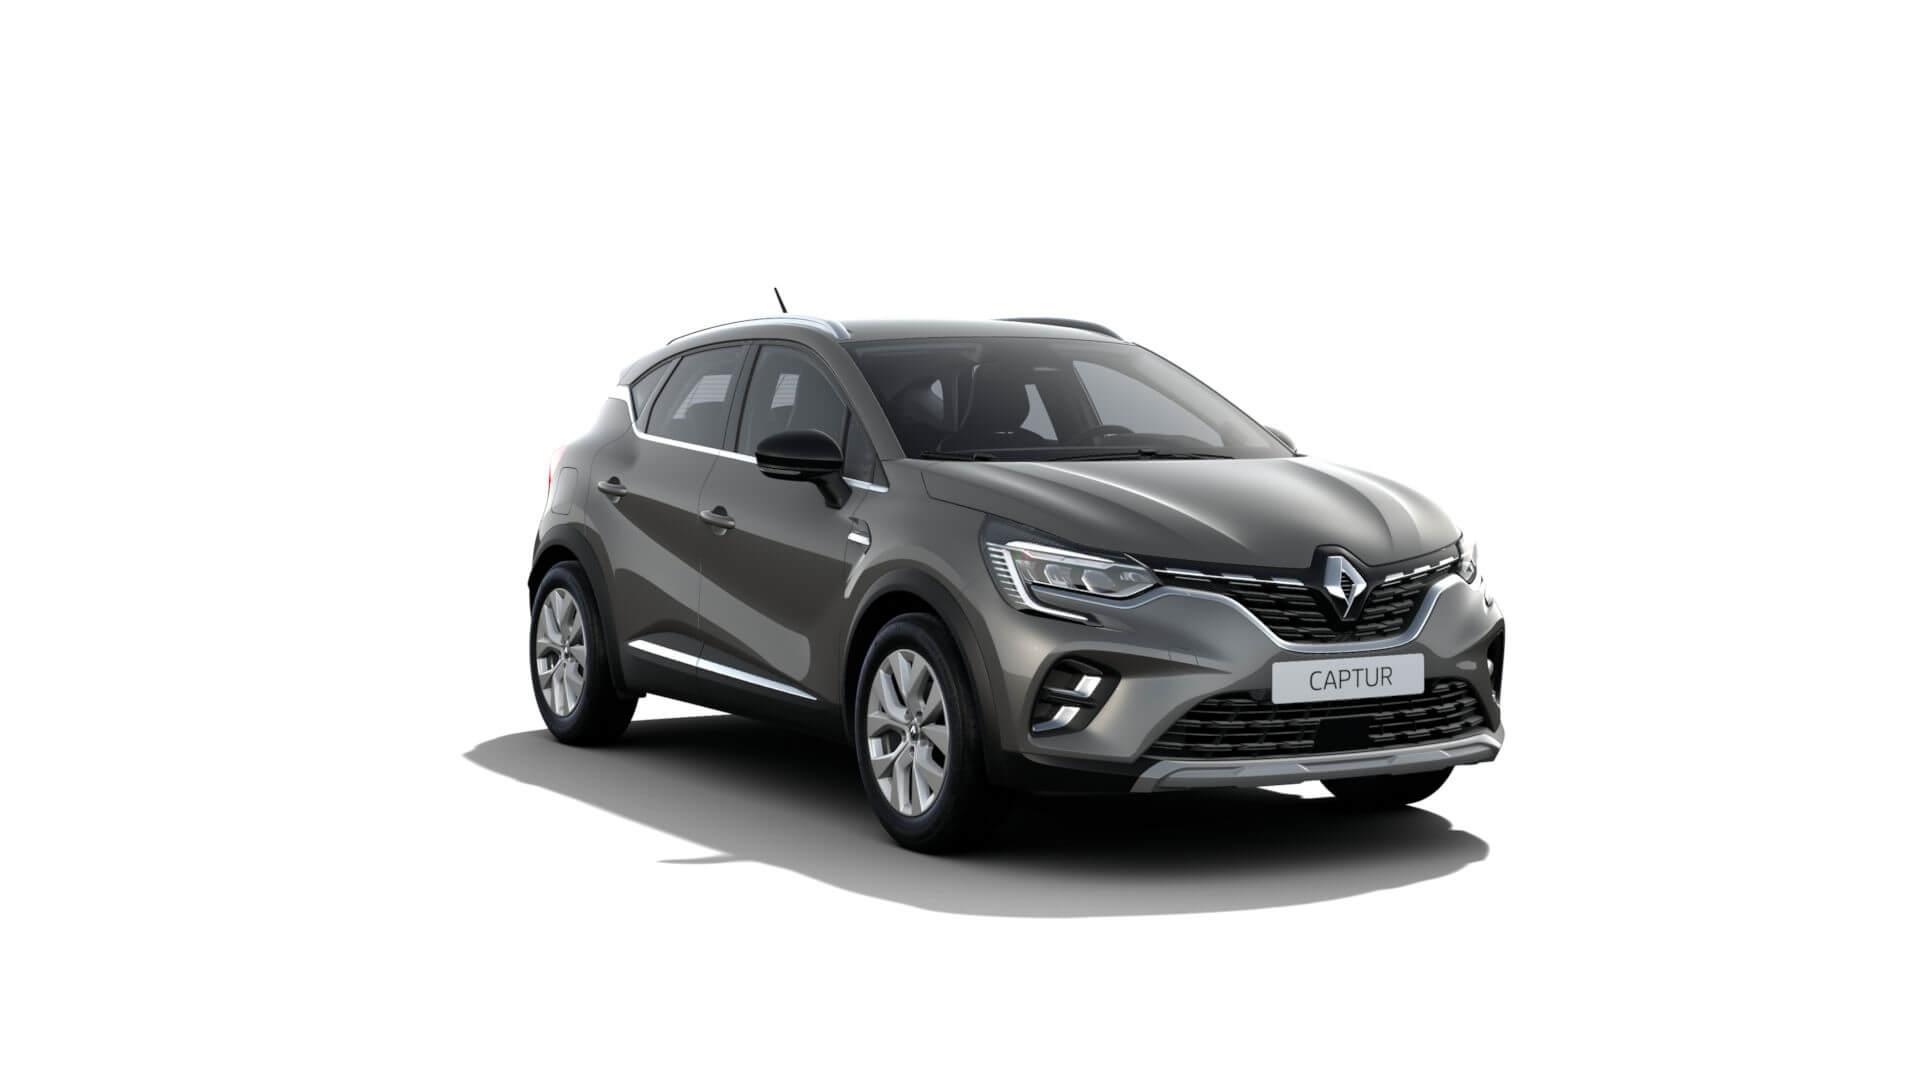 Automodell Anthrazit - Renault Captur - Renault Ahrens Hannover